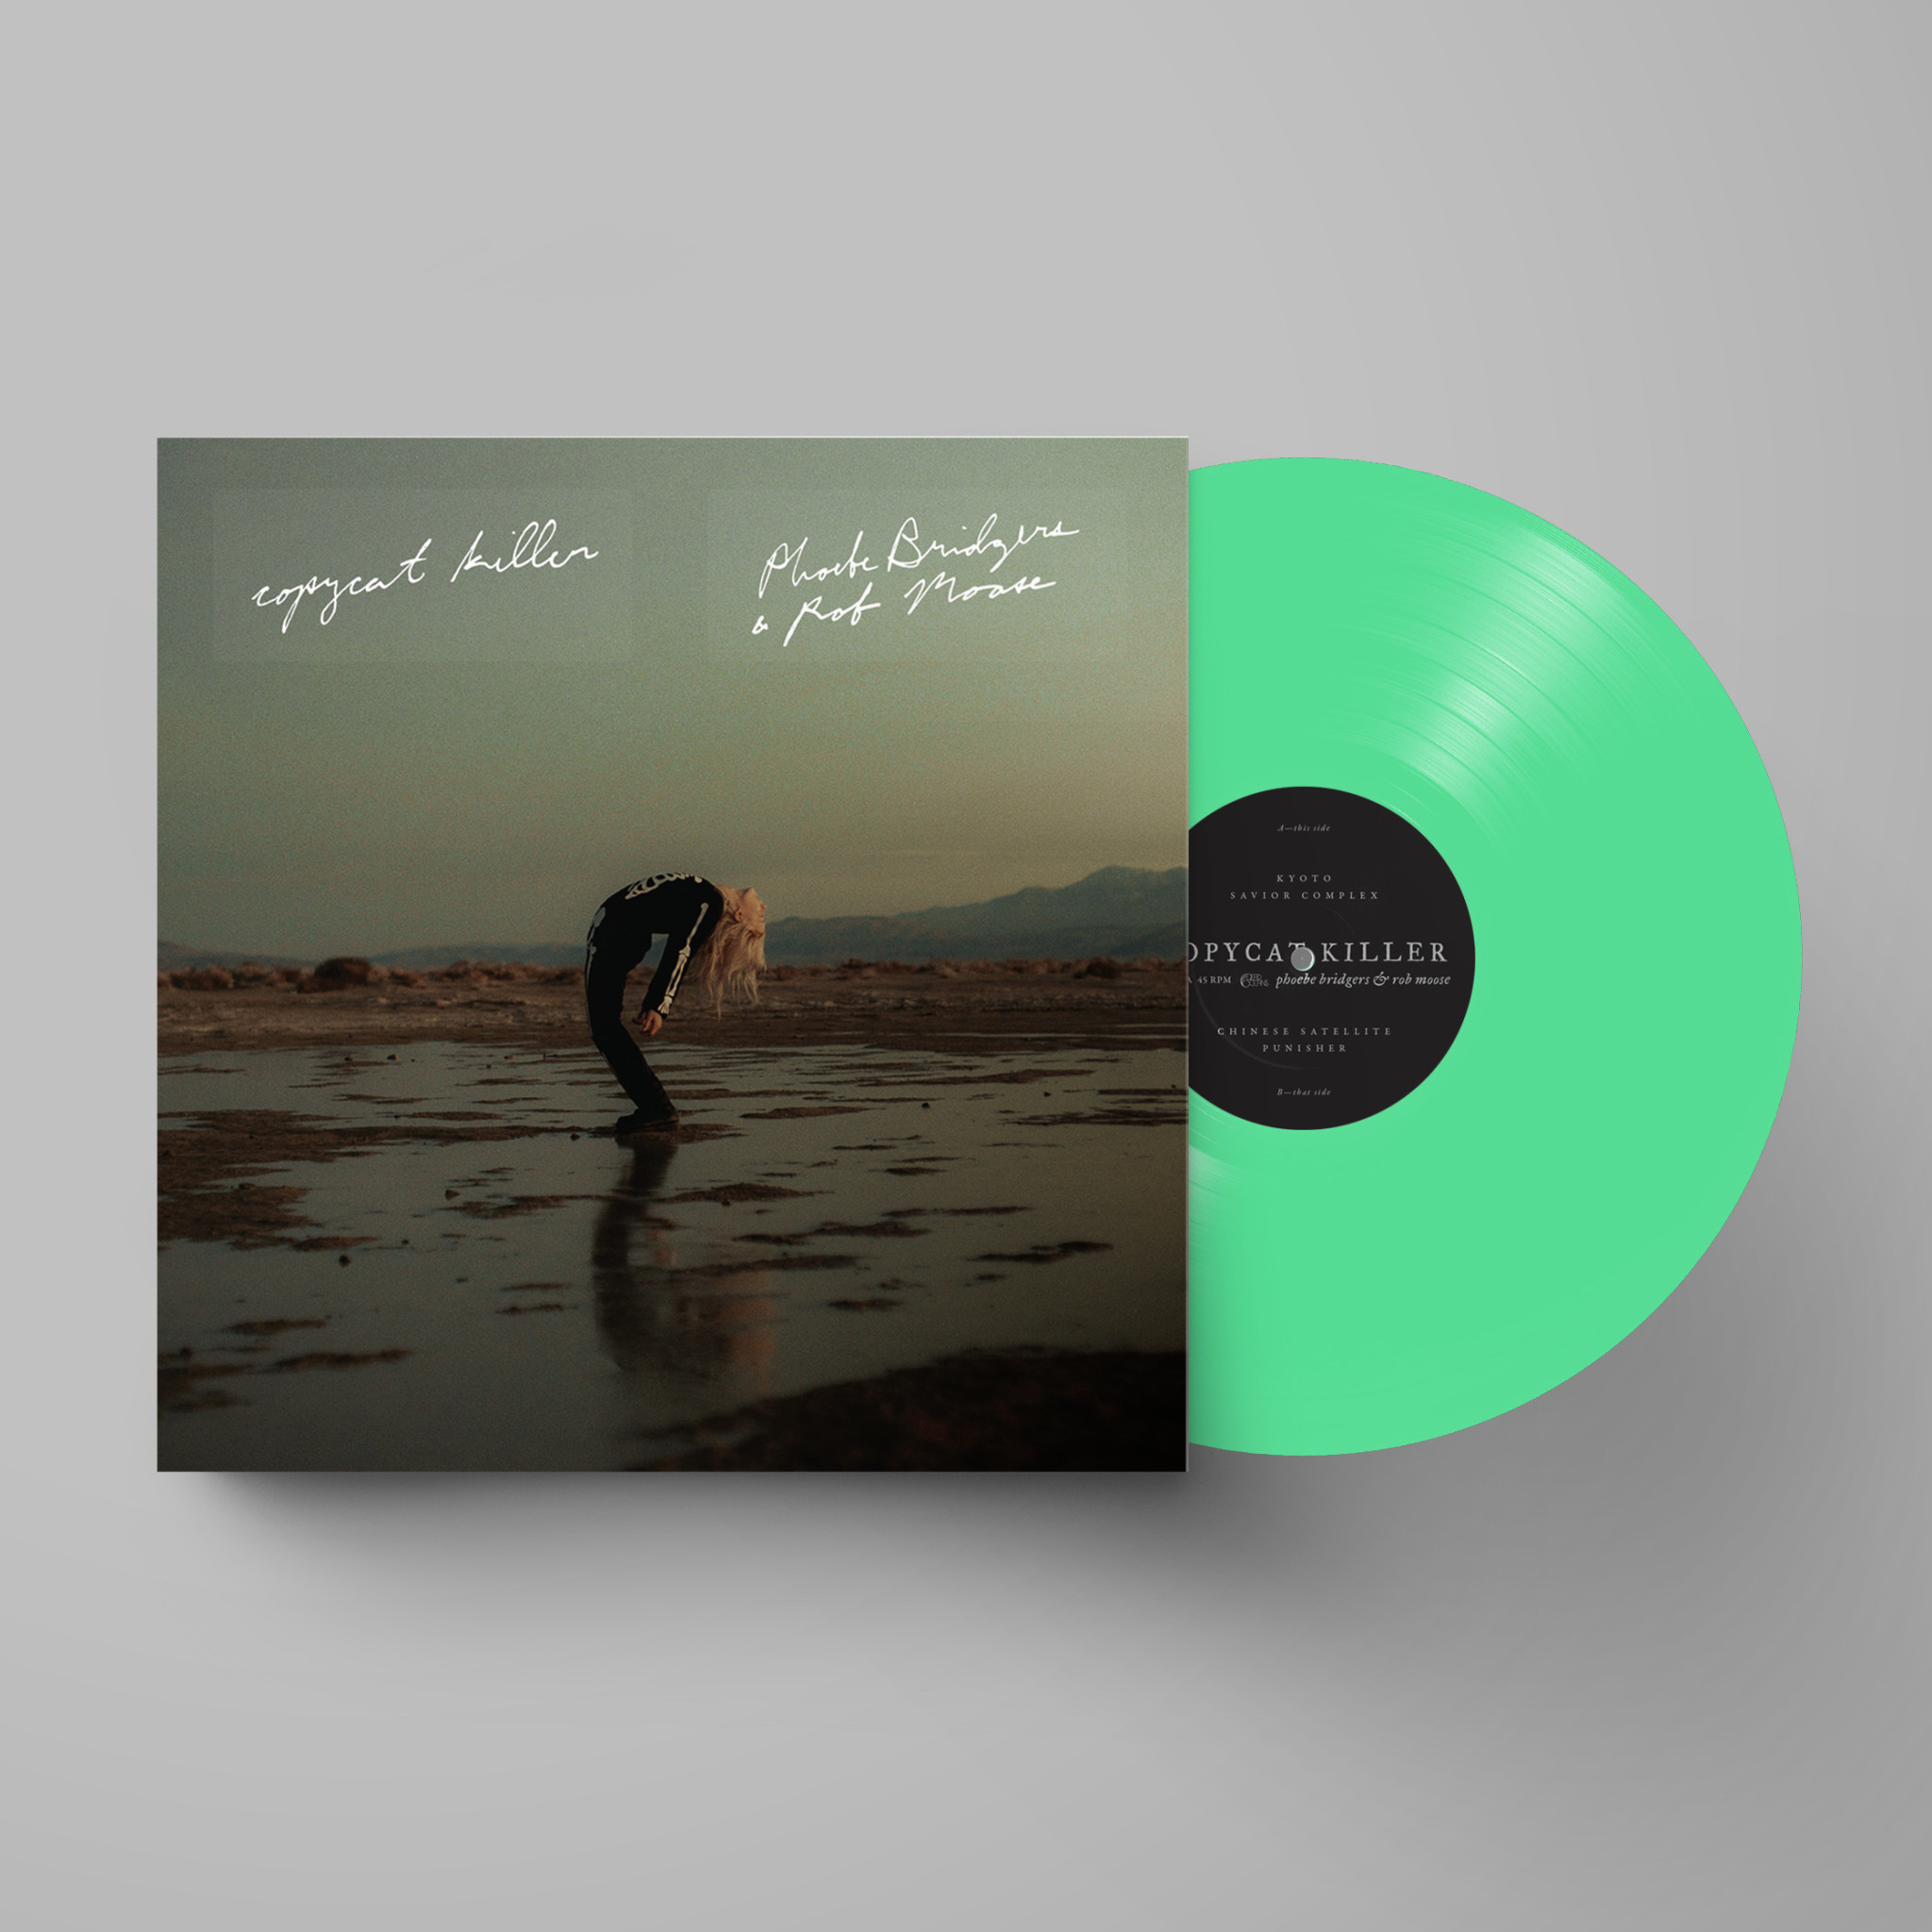 Dead Oceans Phoebe Bridgers - Copycat Killer (Coloured Vinyl)